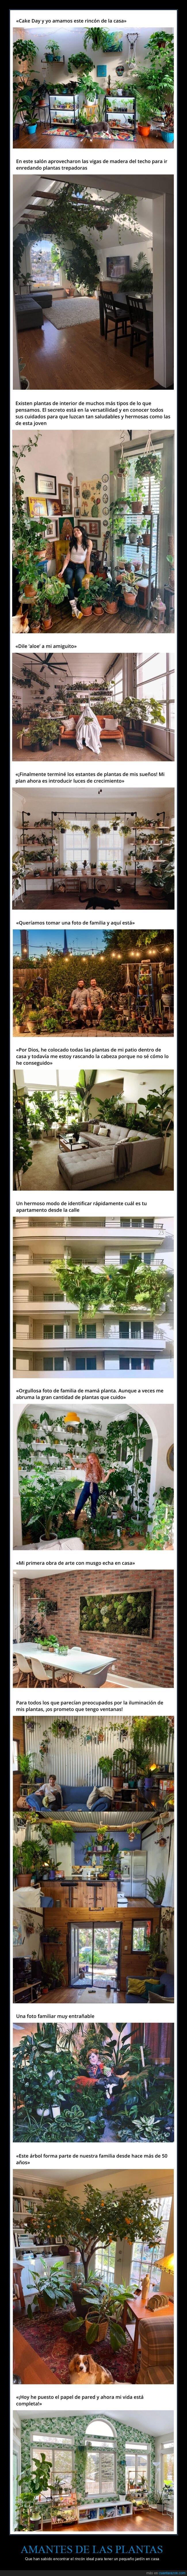 casas,jardines,plantas